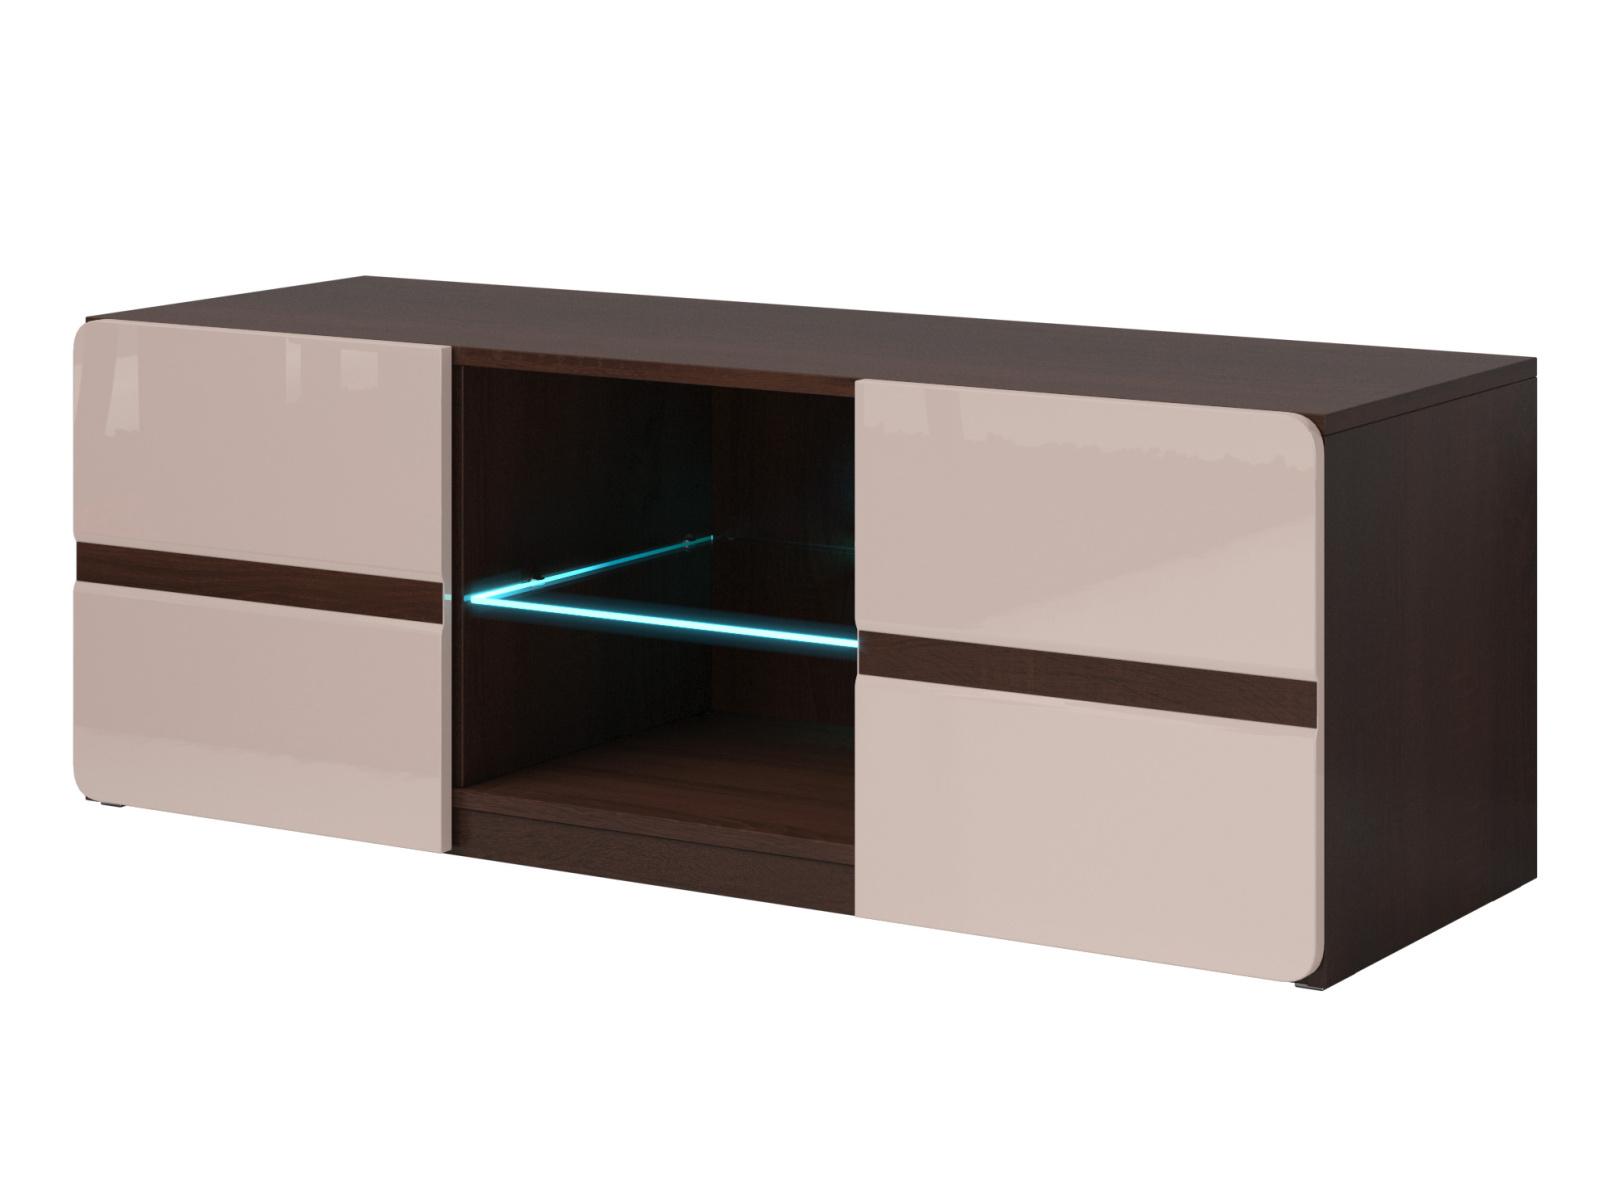 Smartshop SELENE TV stolek TYP 41, dub sonoma tmavý/pískově šedý lesk